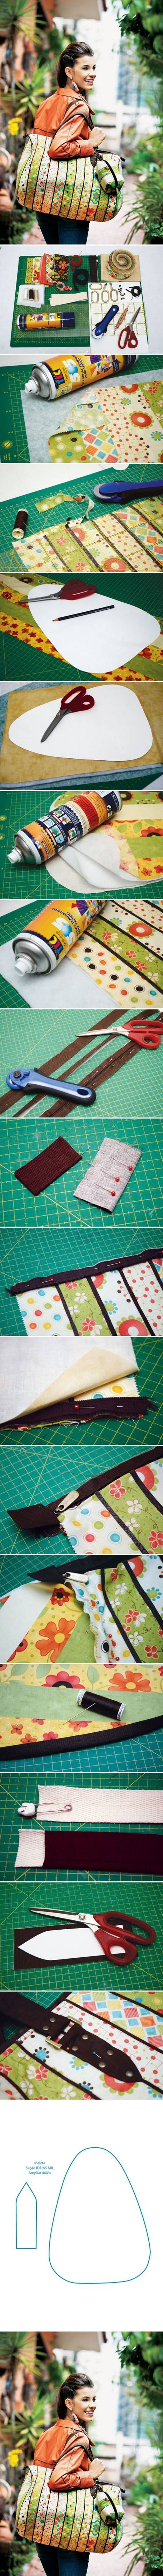 DIY Sew Travel Bag DIY Projects | UsefulDIY.com